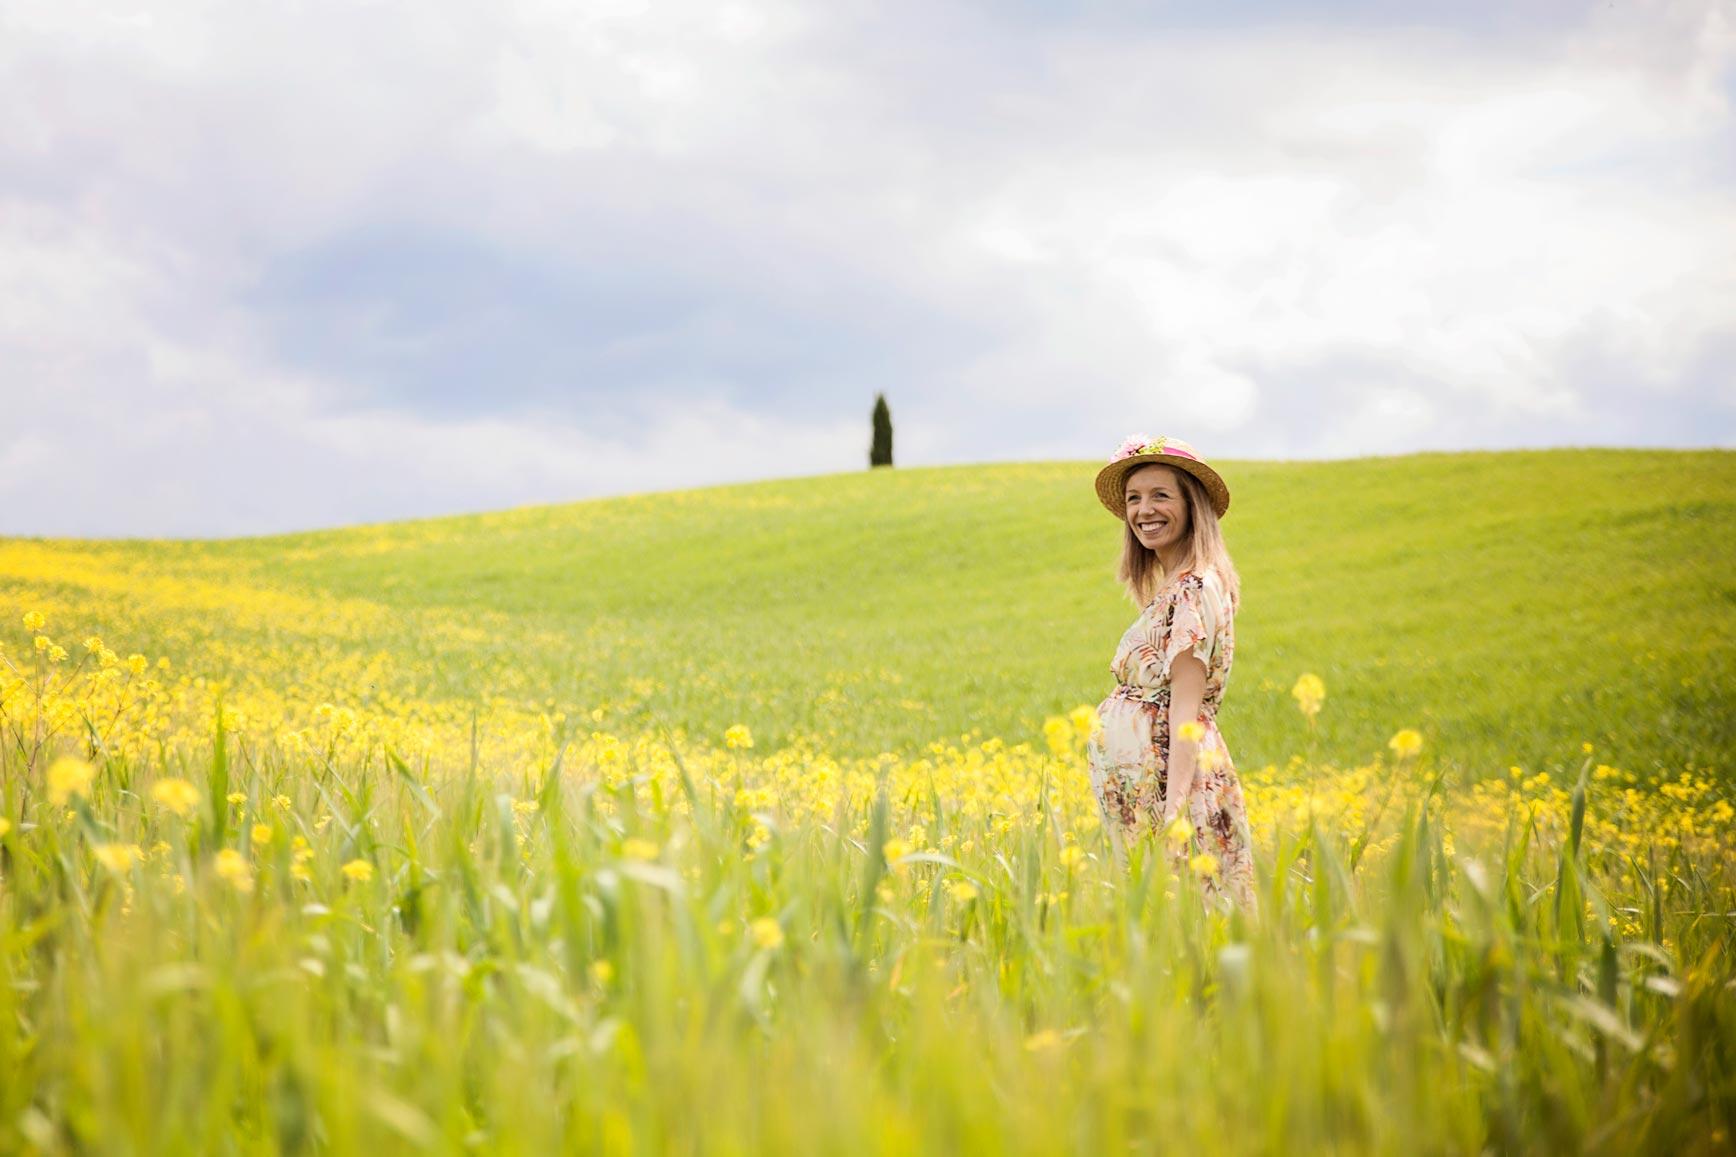 Campos de flores amarillas-claraBmartin-04